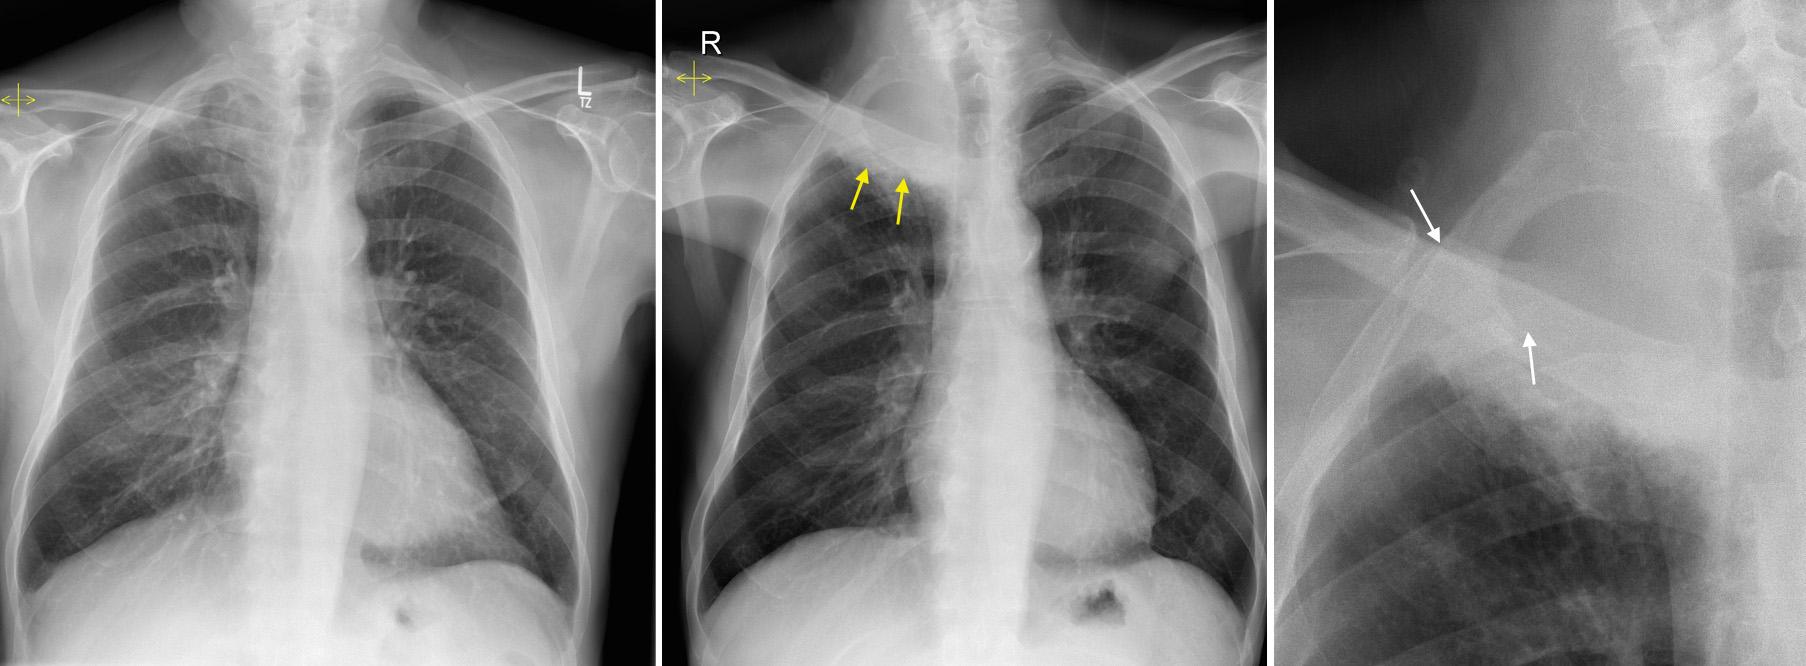 Pancoast Tumour Radiology At St Vincent S University